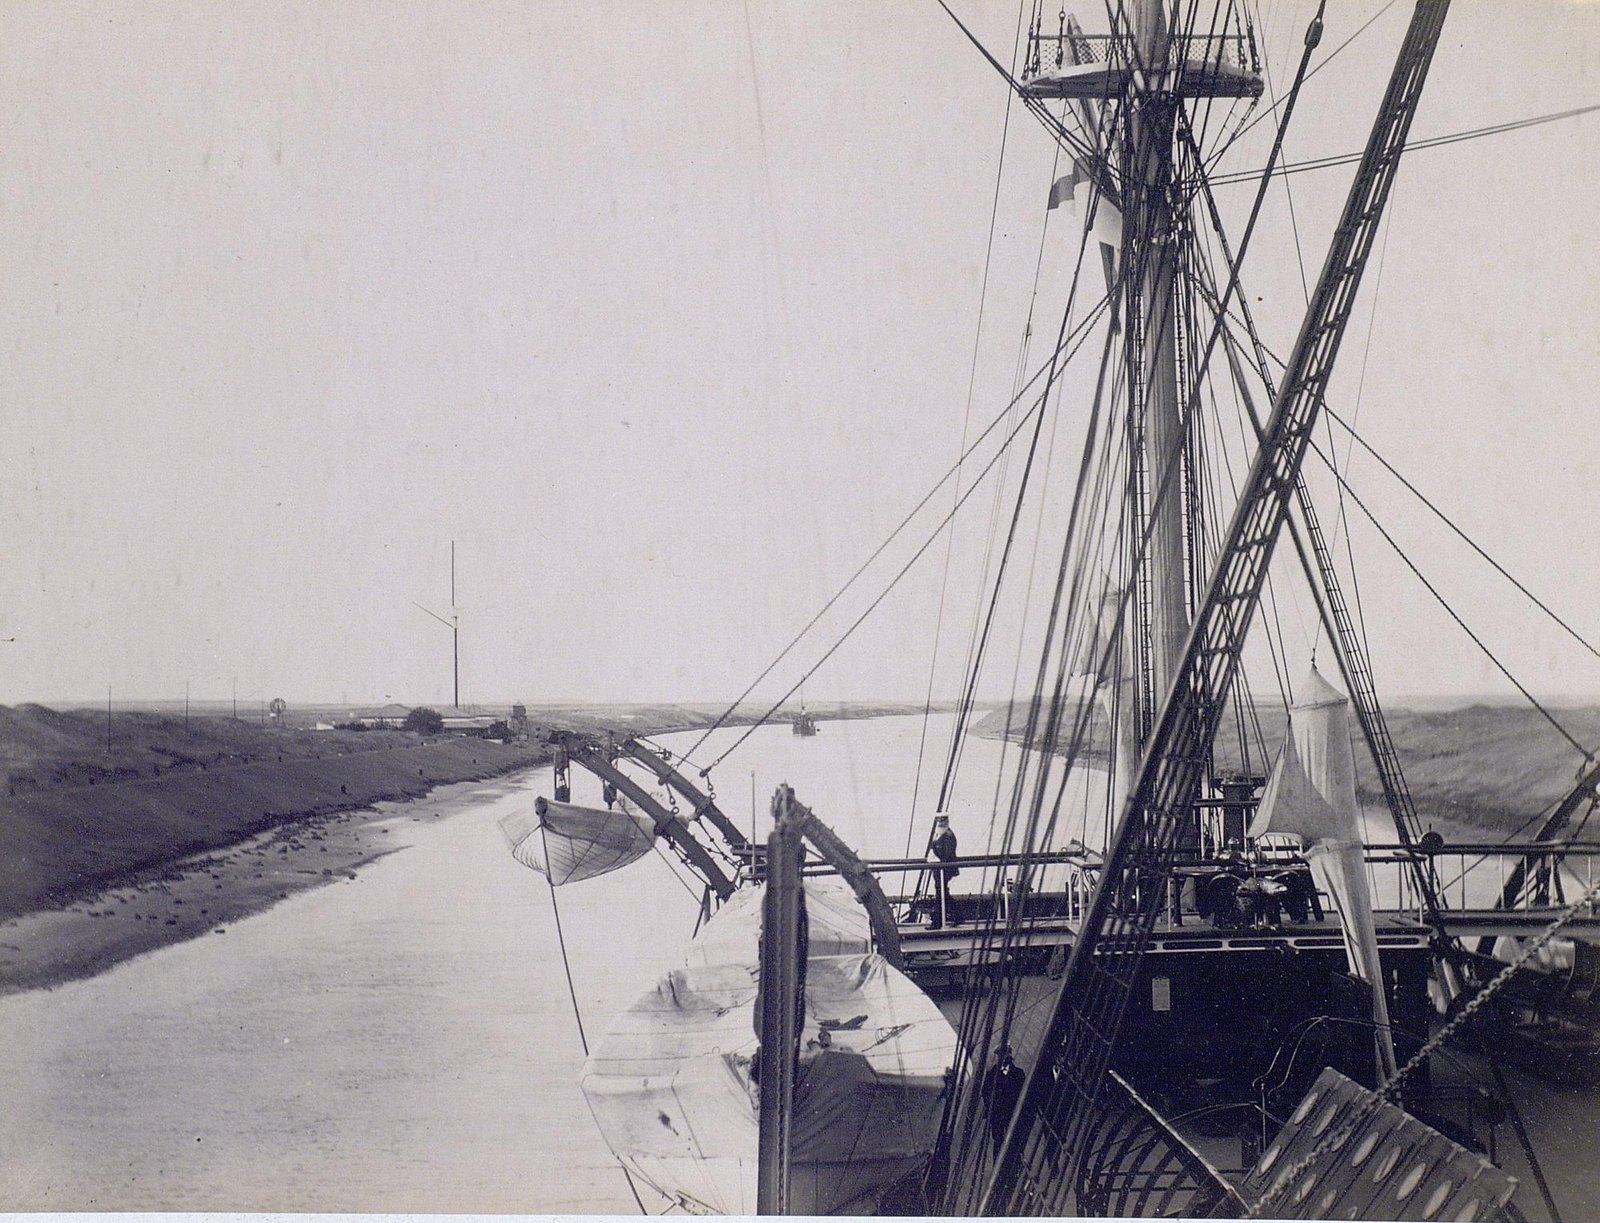 26. 1890. Египет. Фрегат «Память Азова» в Суэцком канале.